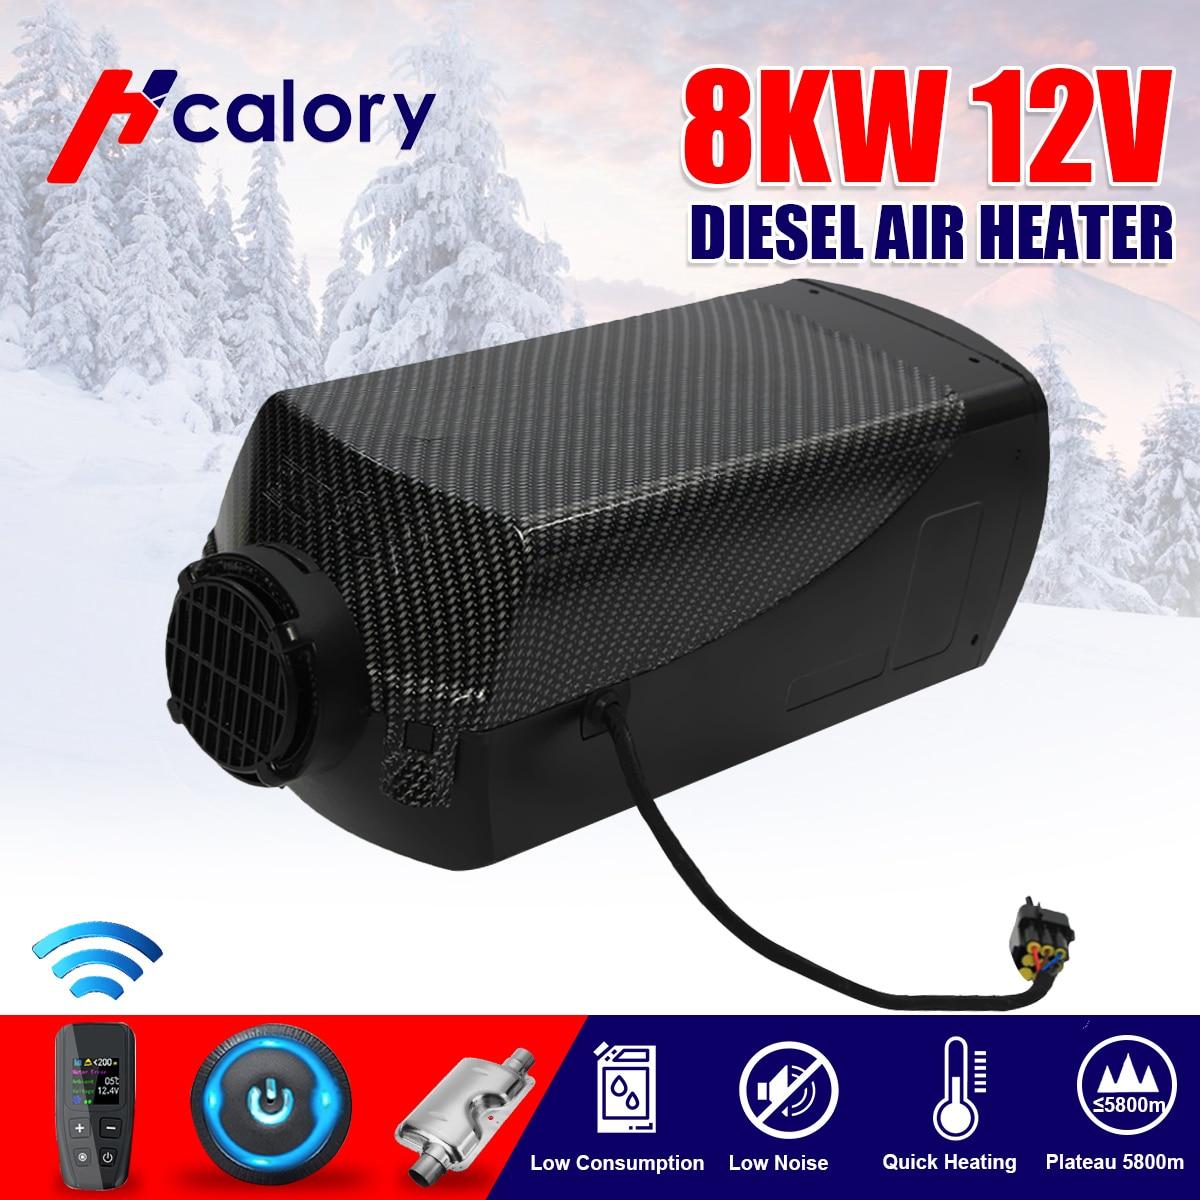 Calentador de aire diésel de 12V 8000W, nuevo interruptor LCD + máquina de Control remoto integrado para furgoneta, barco, autobús RV